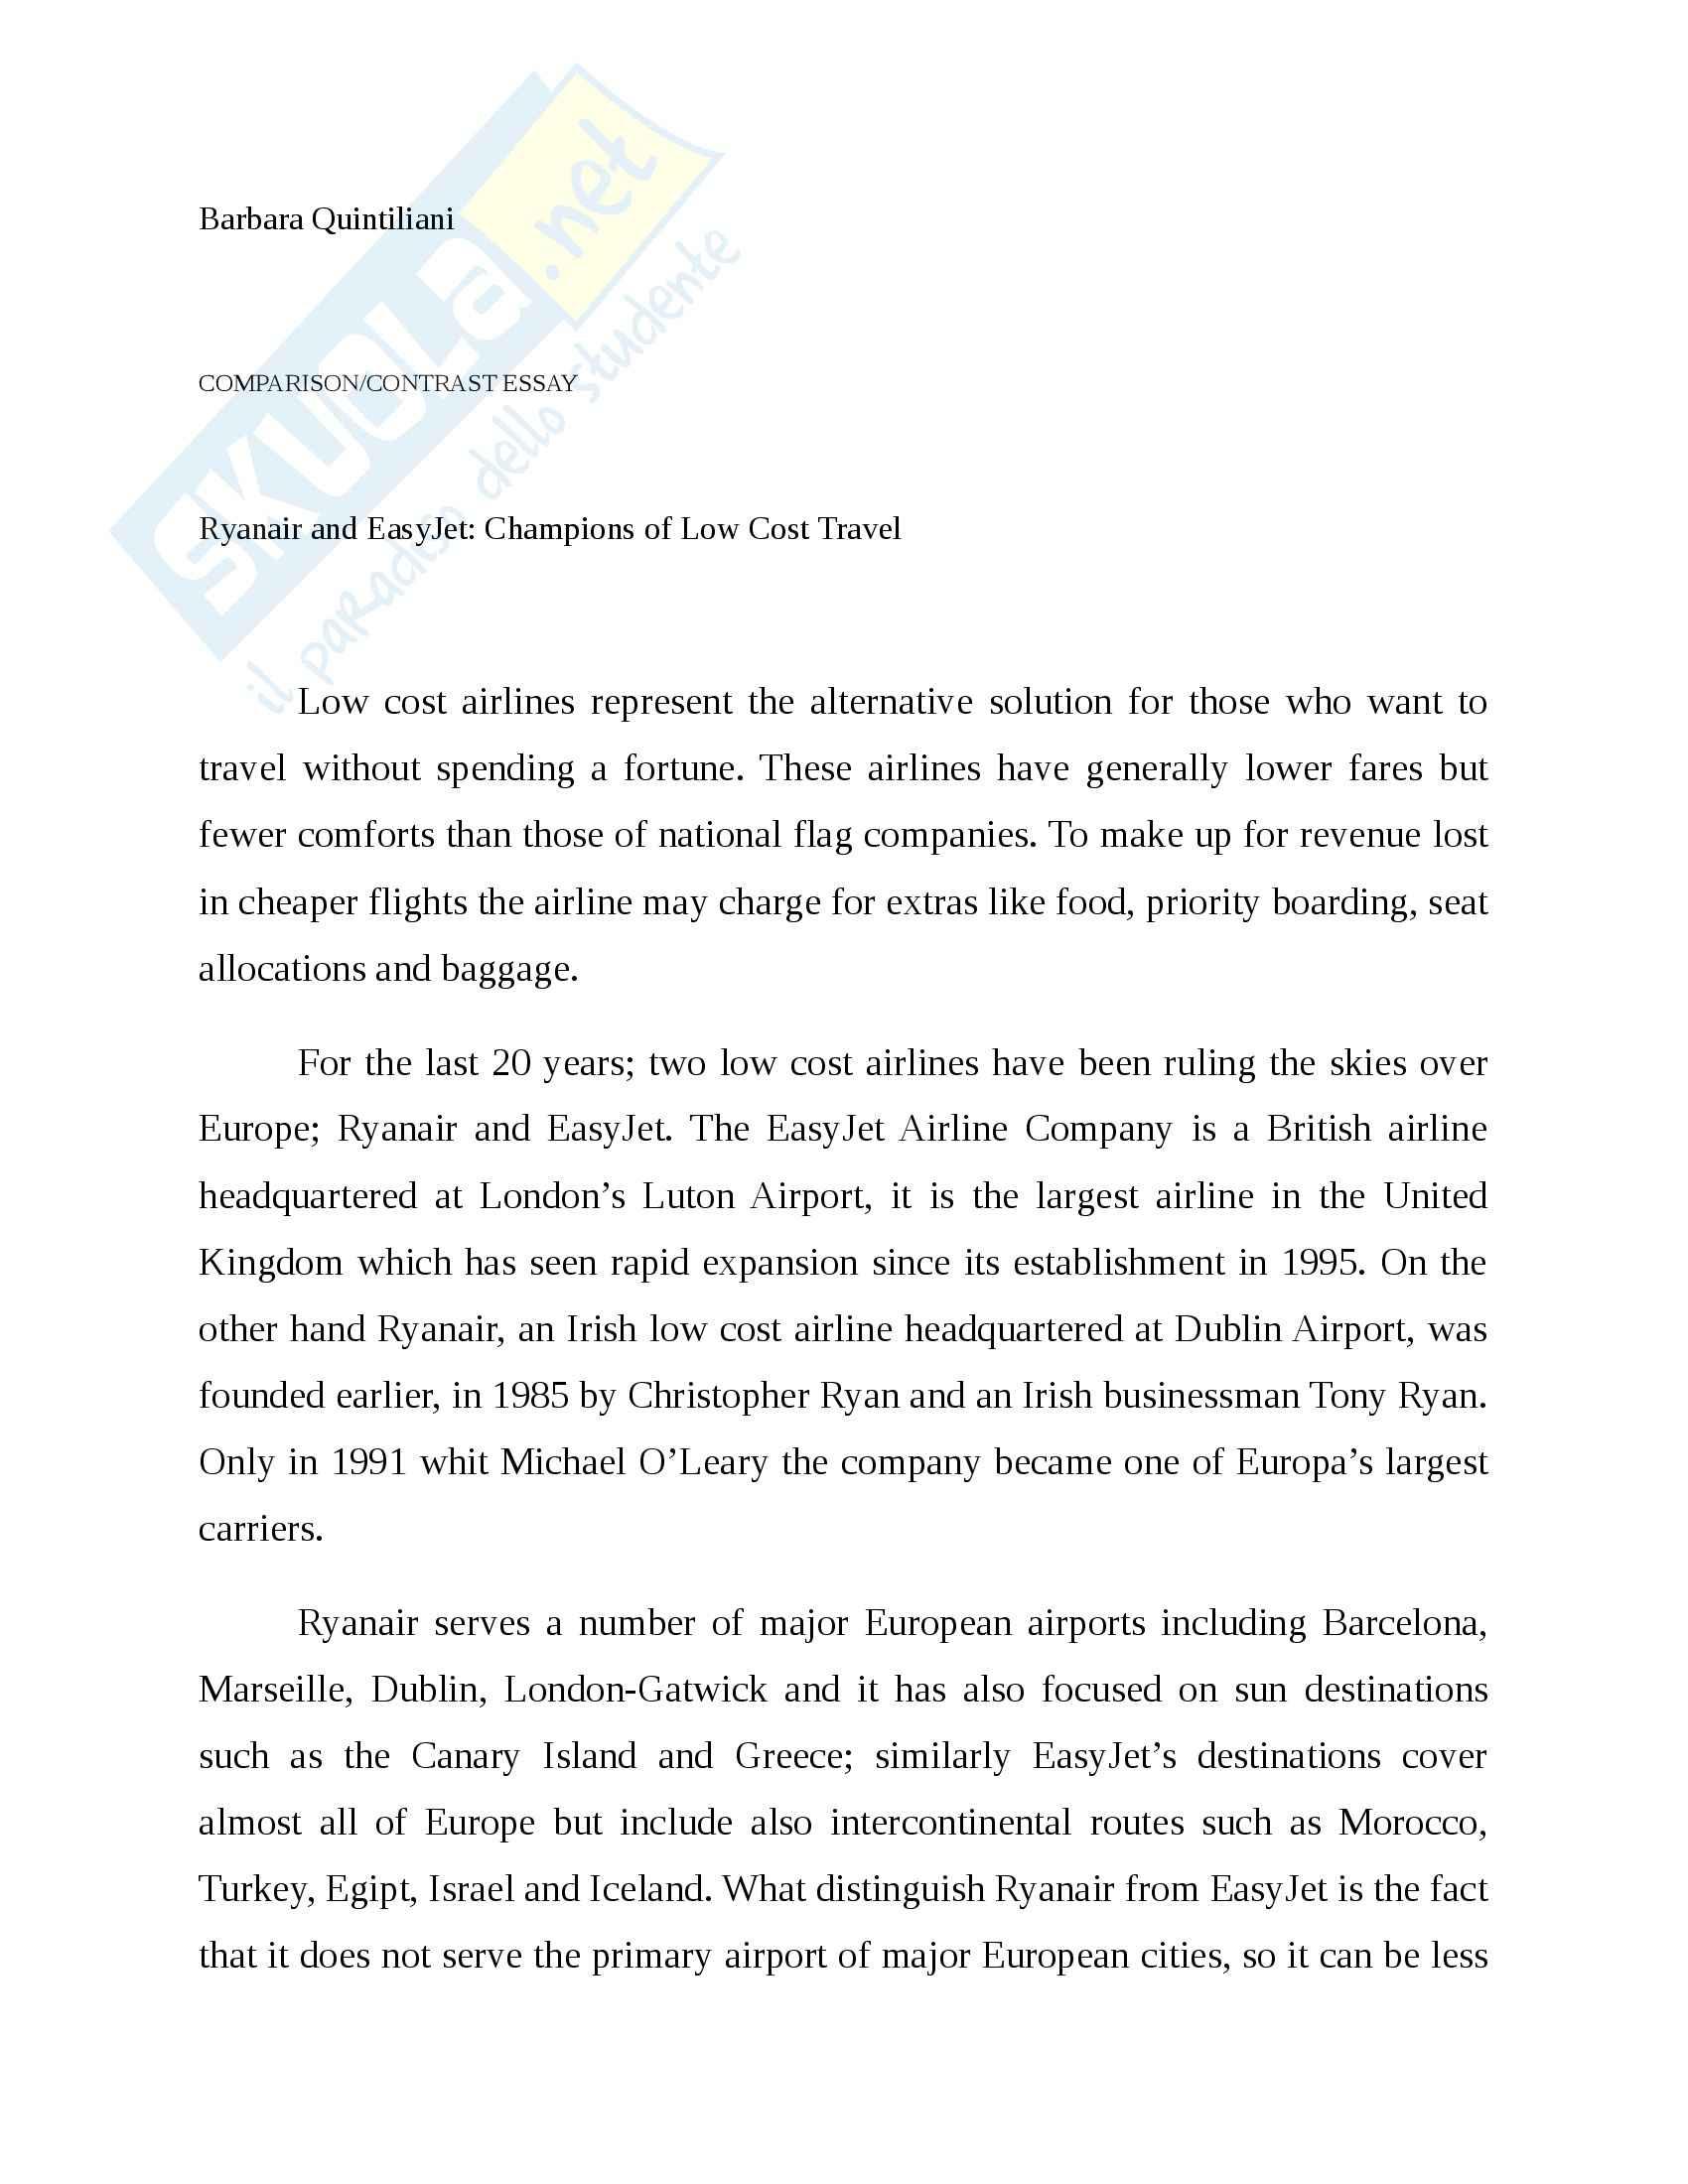 thesis traduci inglese